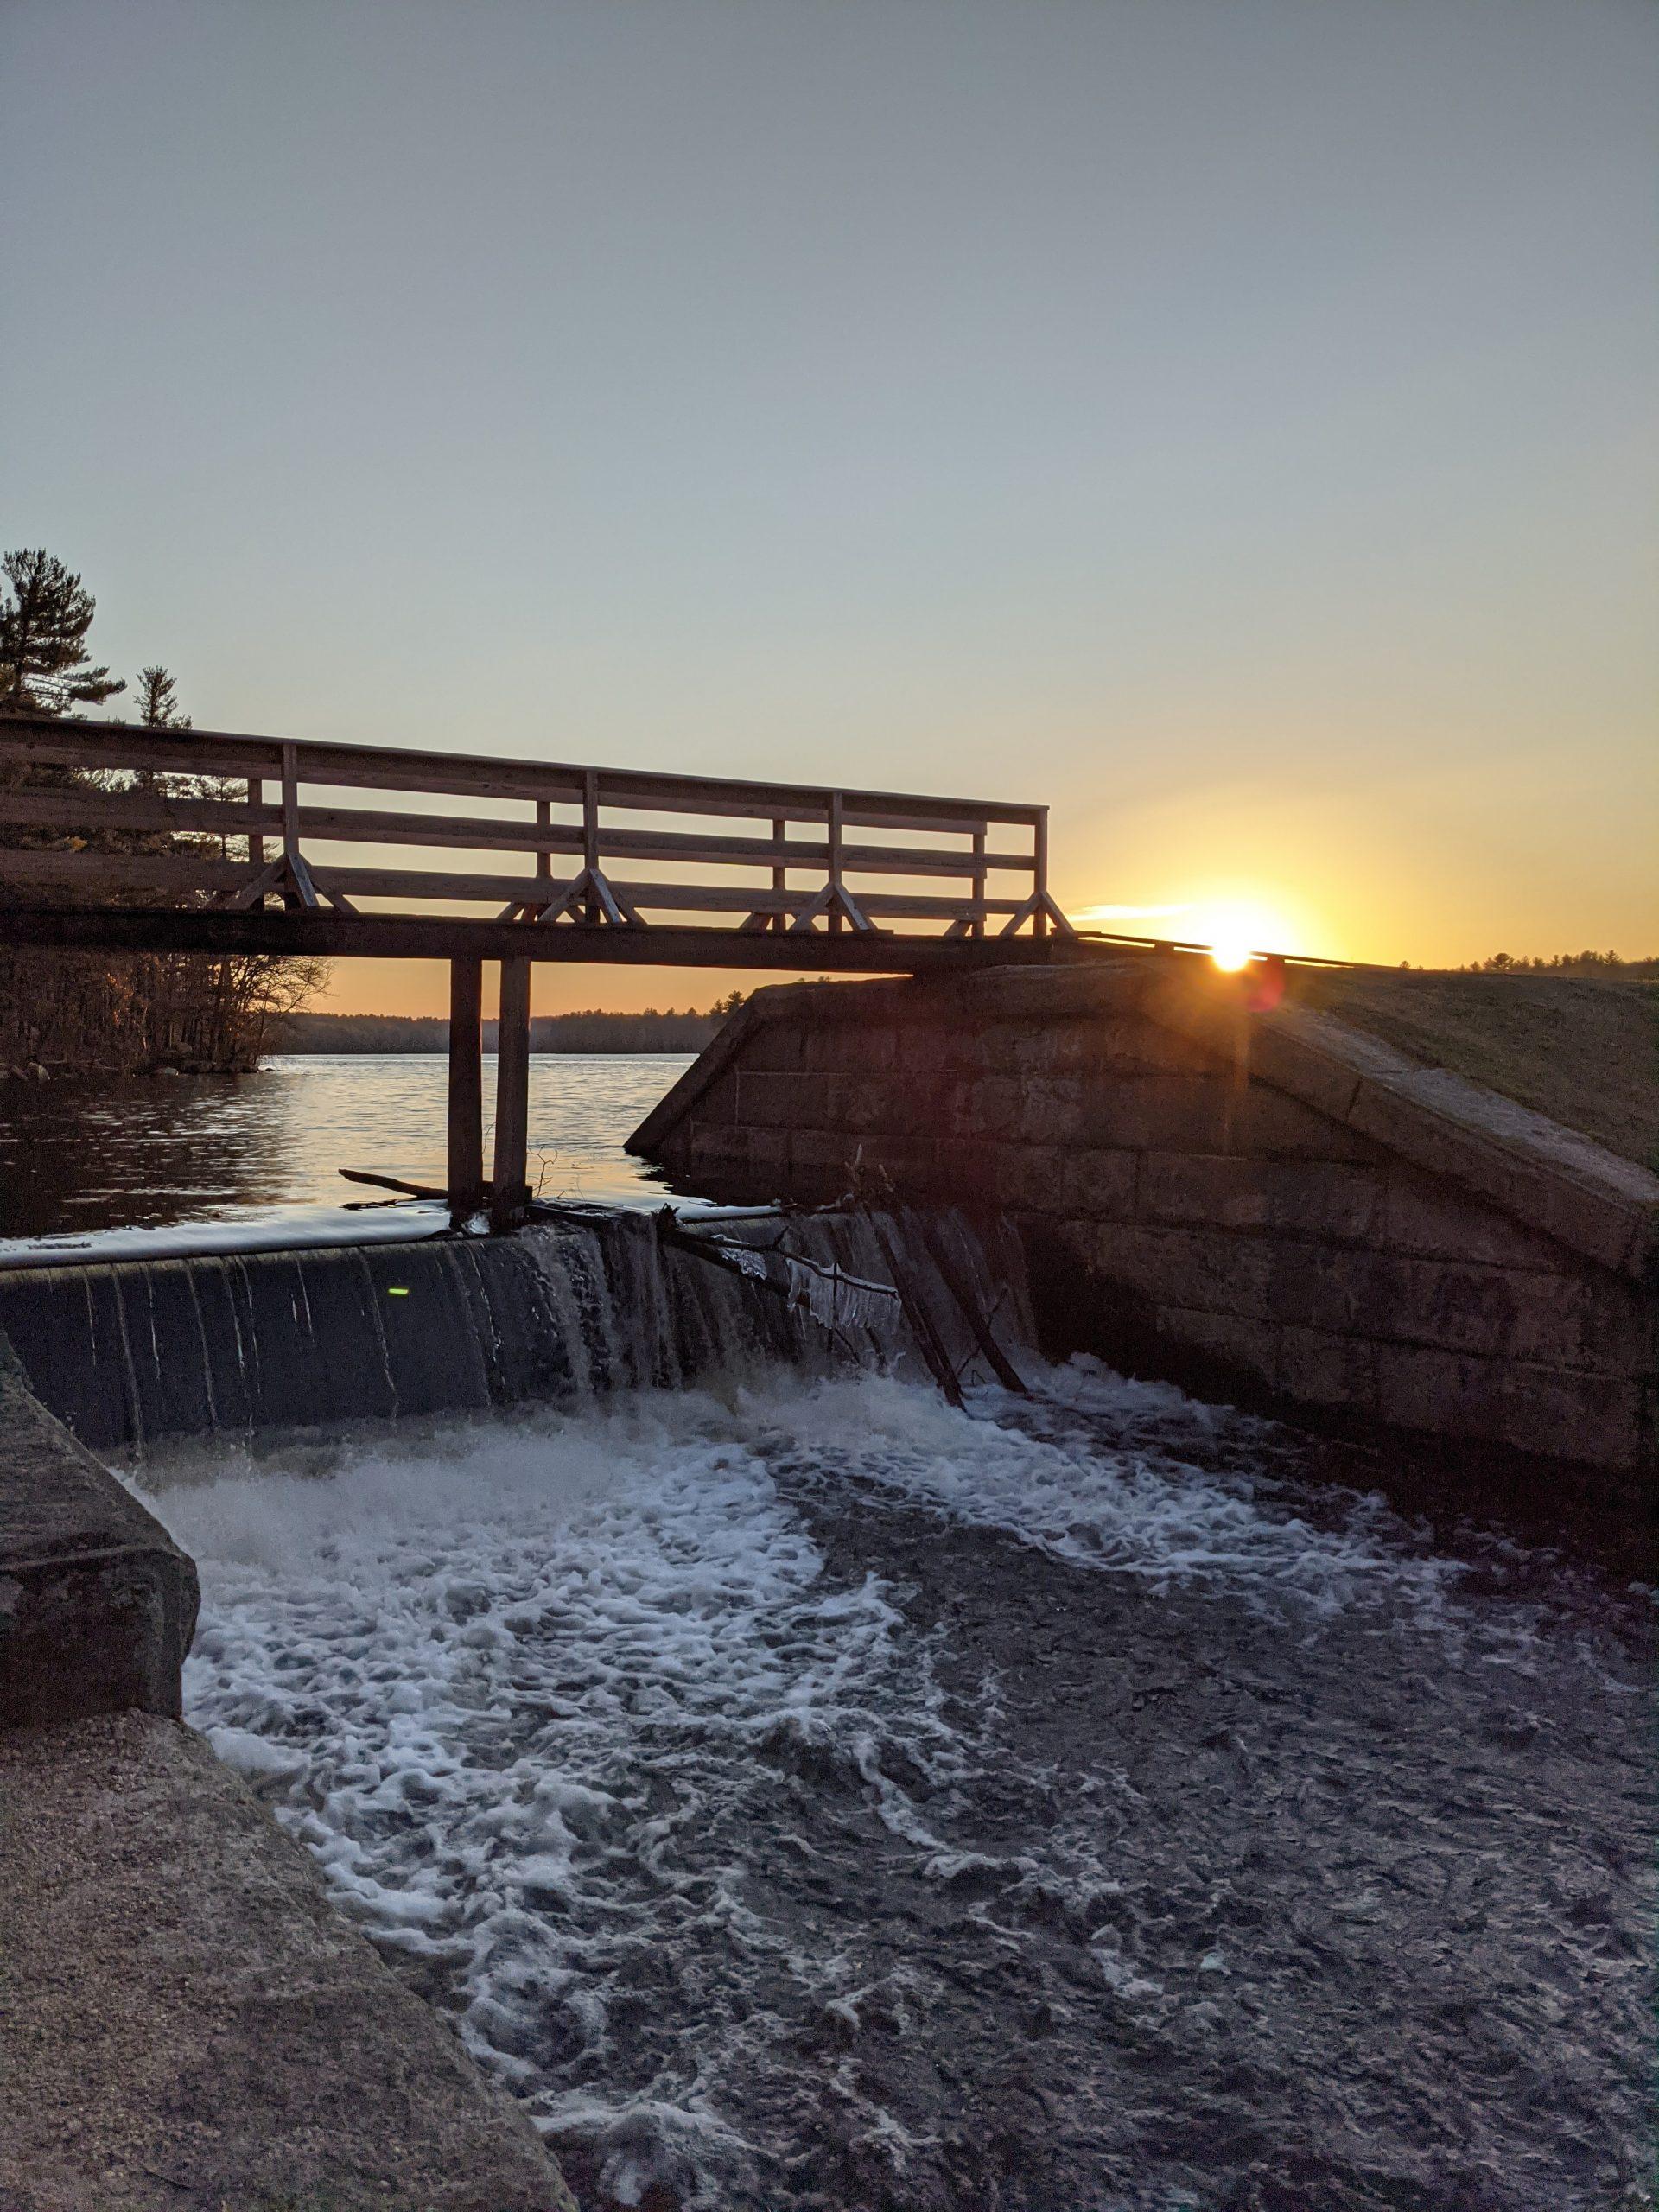 Ashland Reservoir Spillway & Pedestrian Bridge December 28, 2020